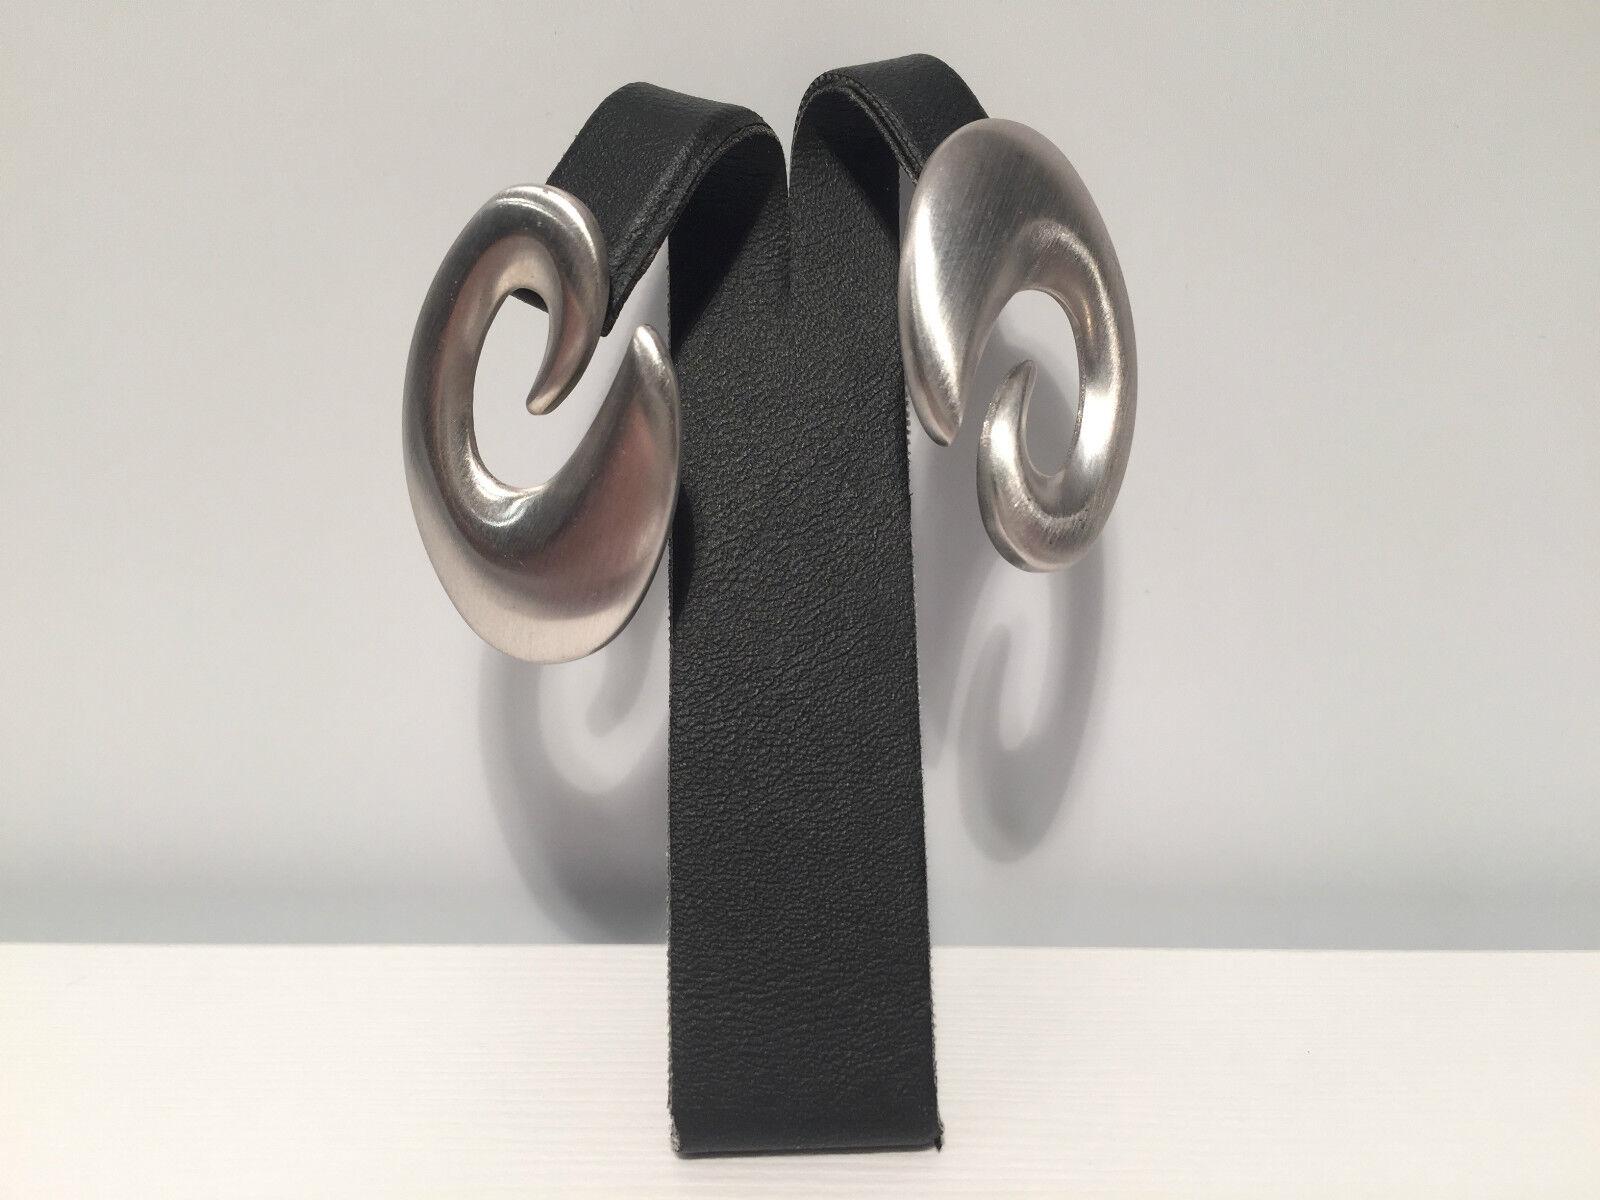 New - Pendientes EarRings BREIL BREIL BREIL - Steel Acero - Espiral eb3281